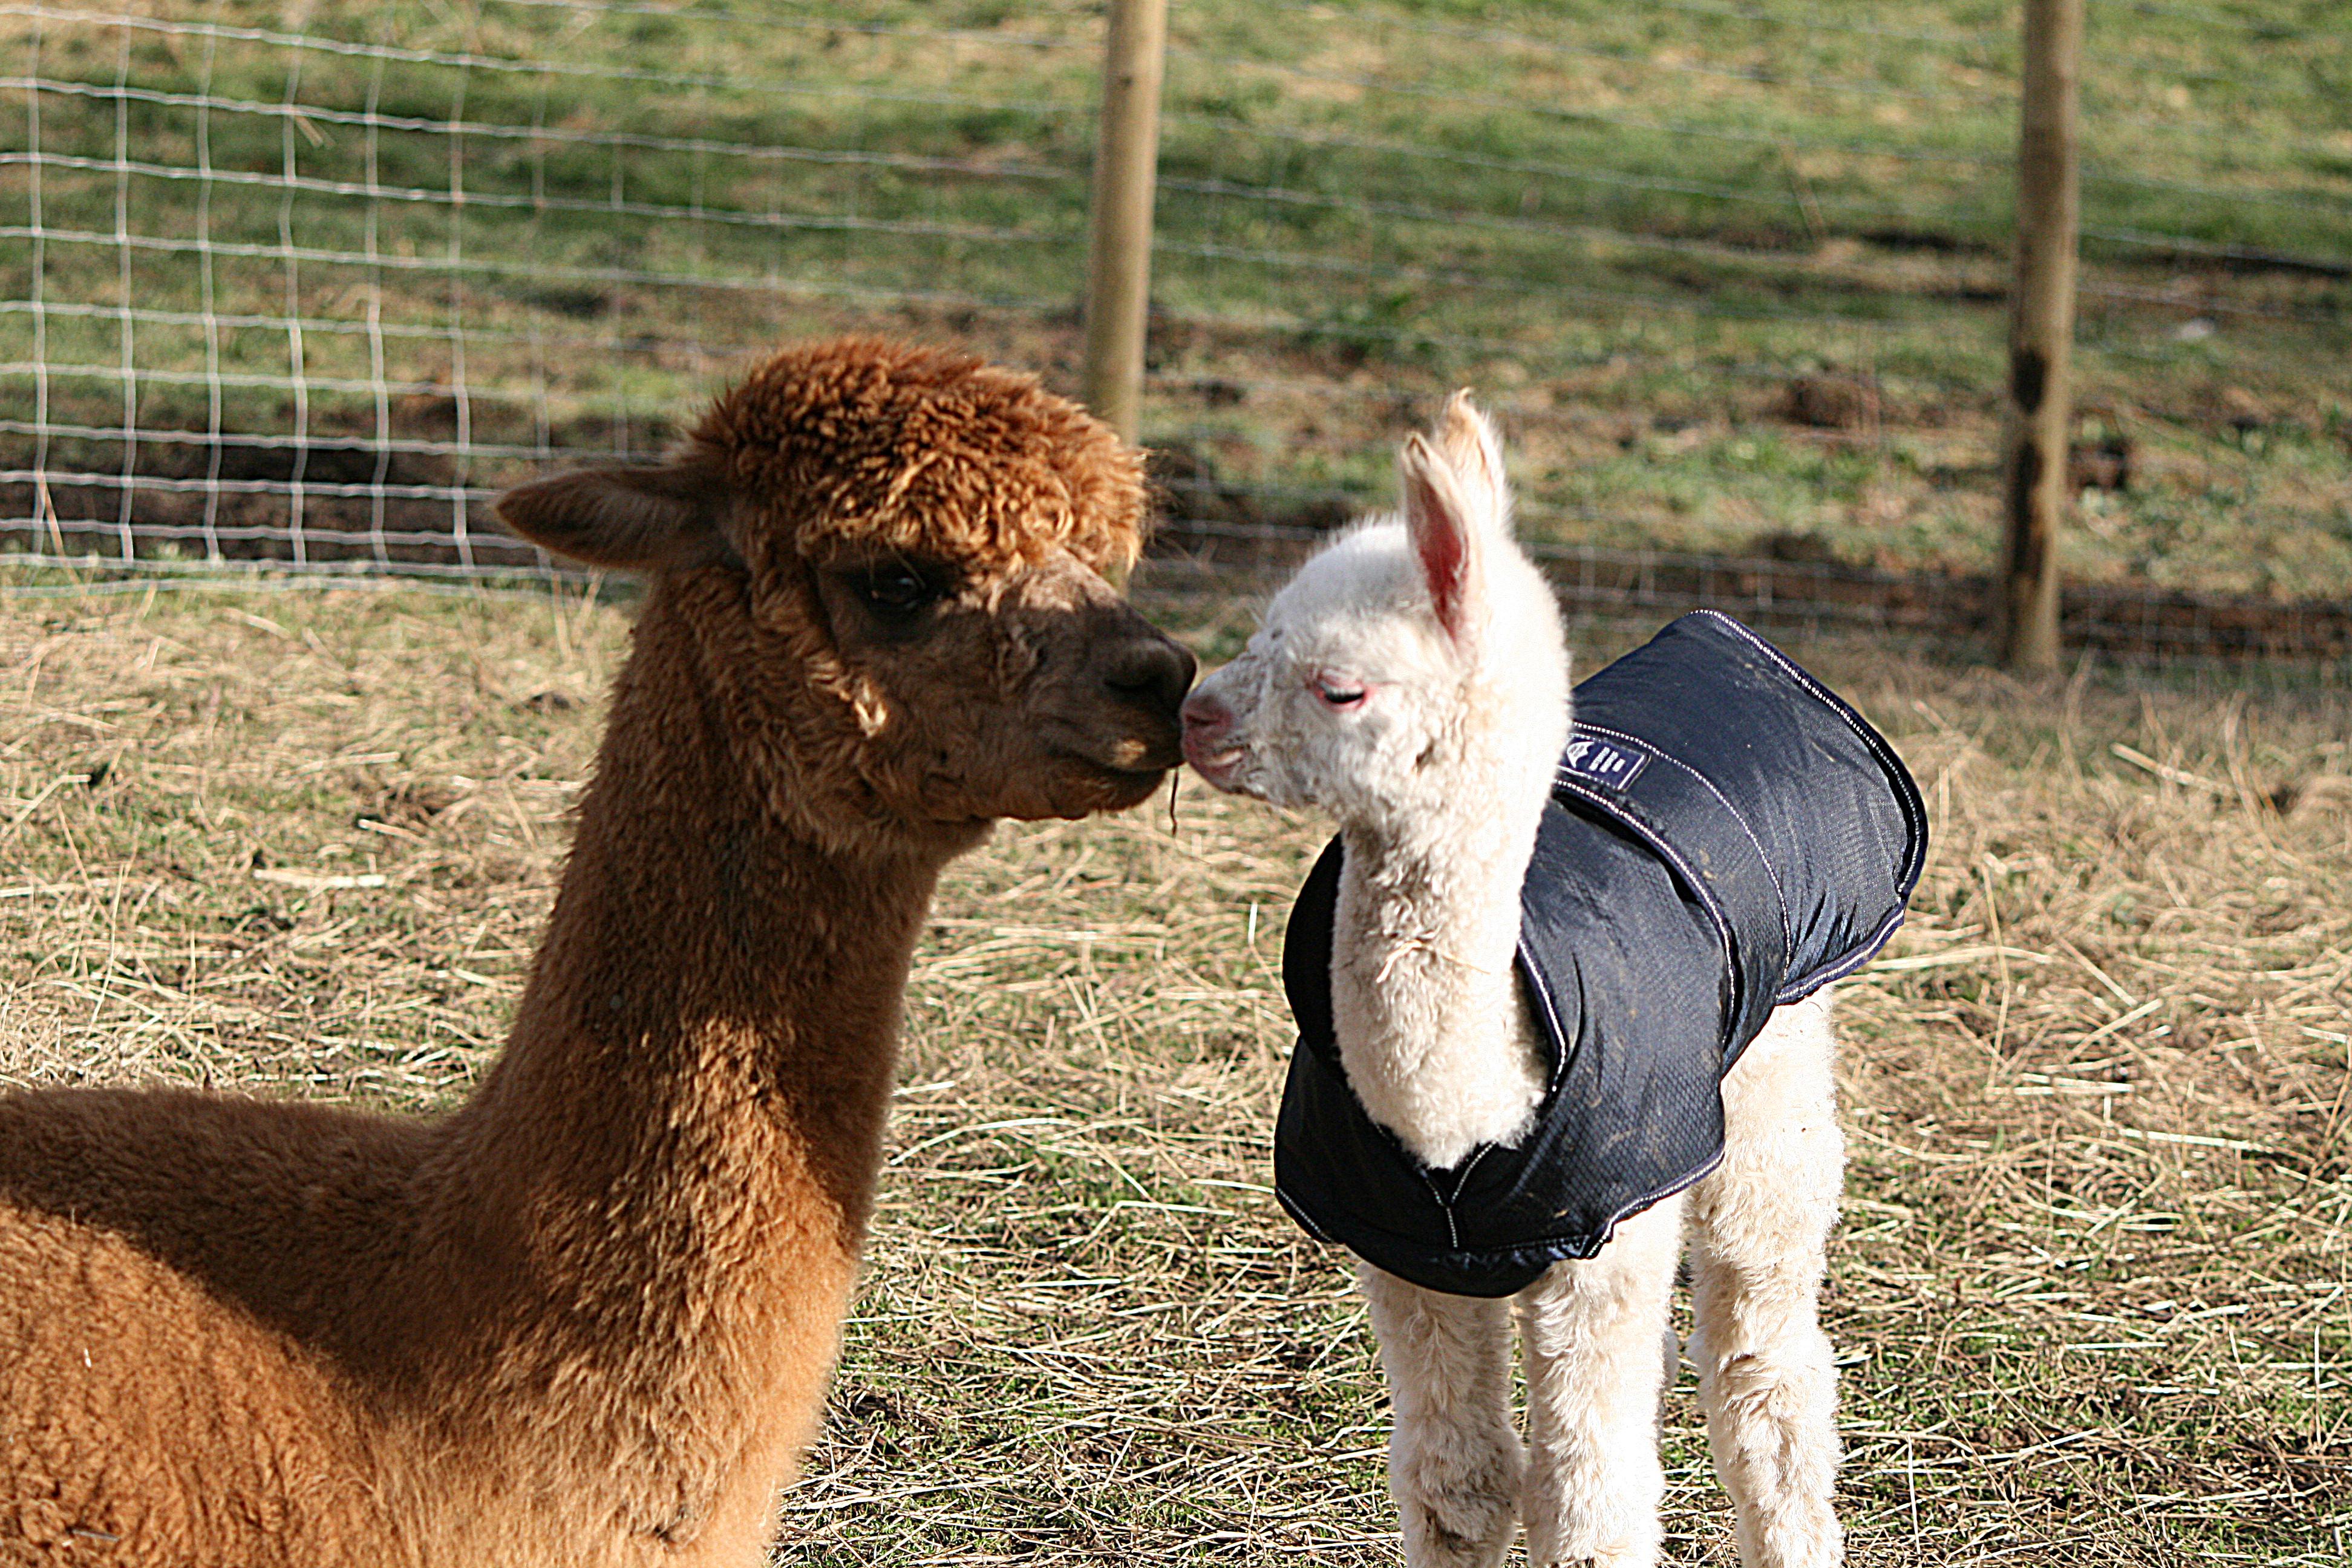 Michaela and Spirit kissing